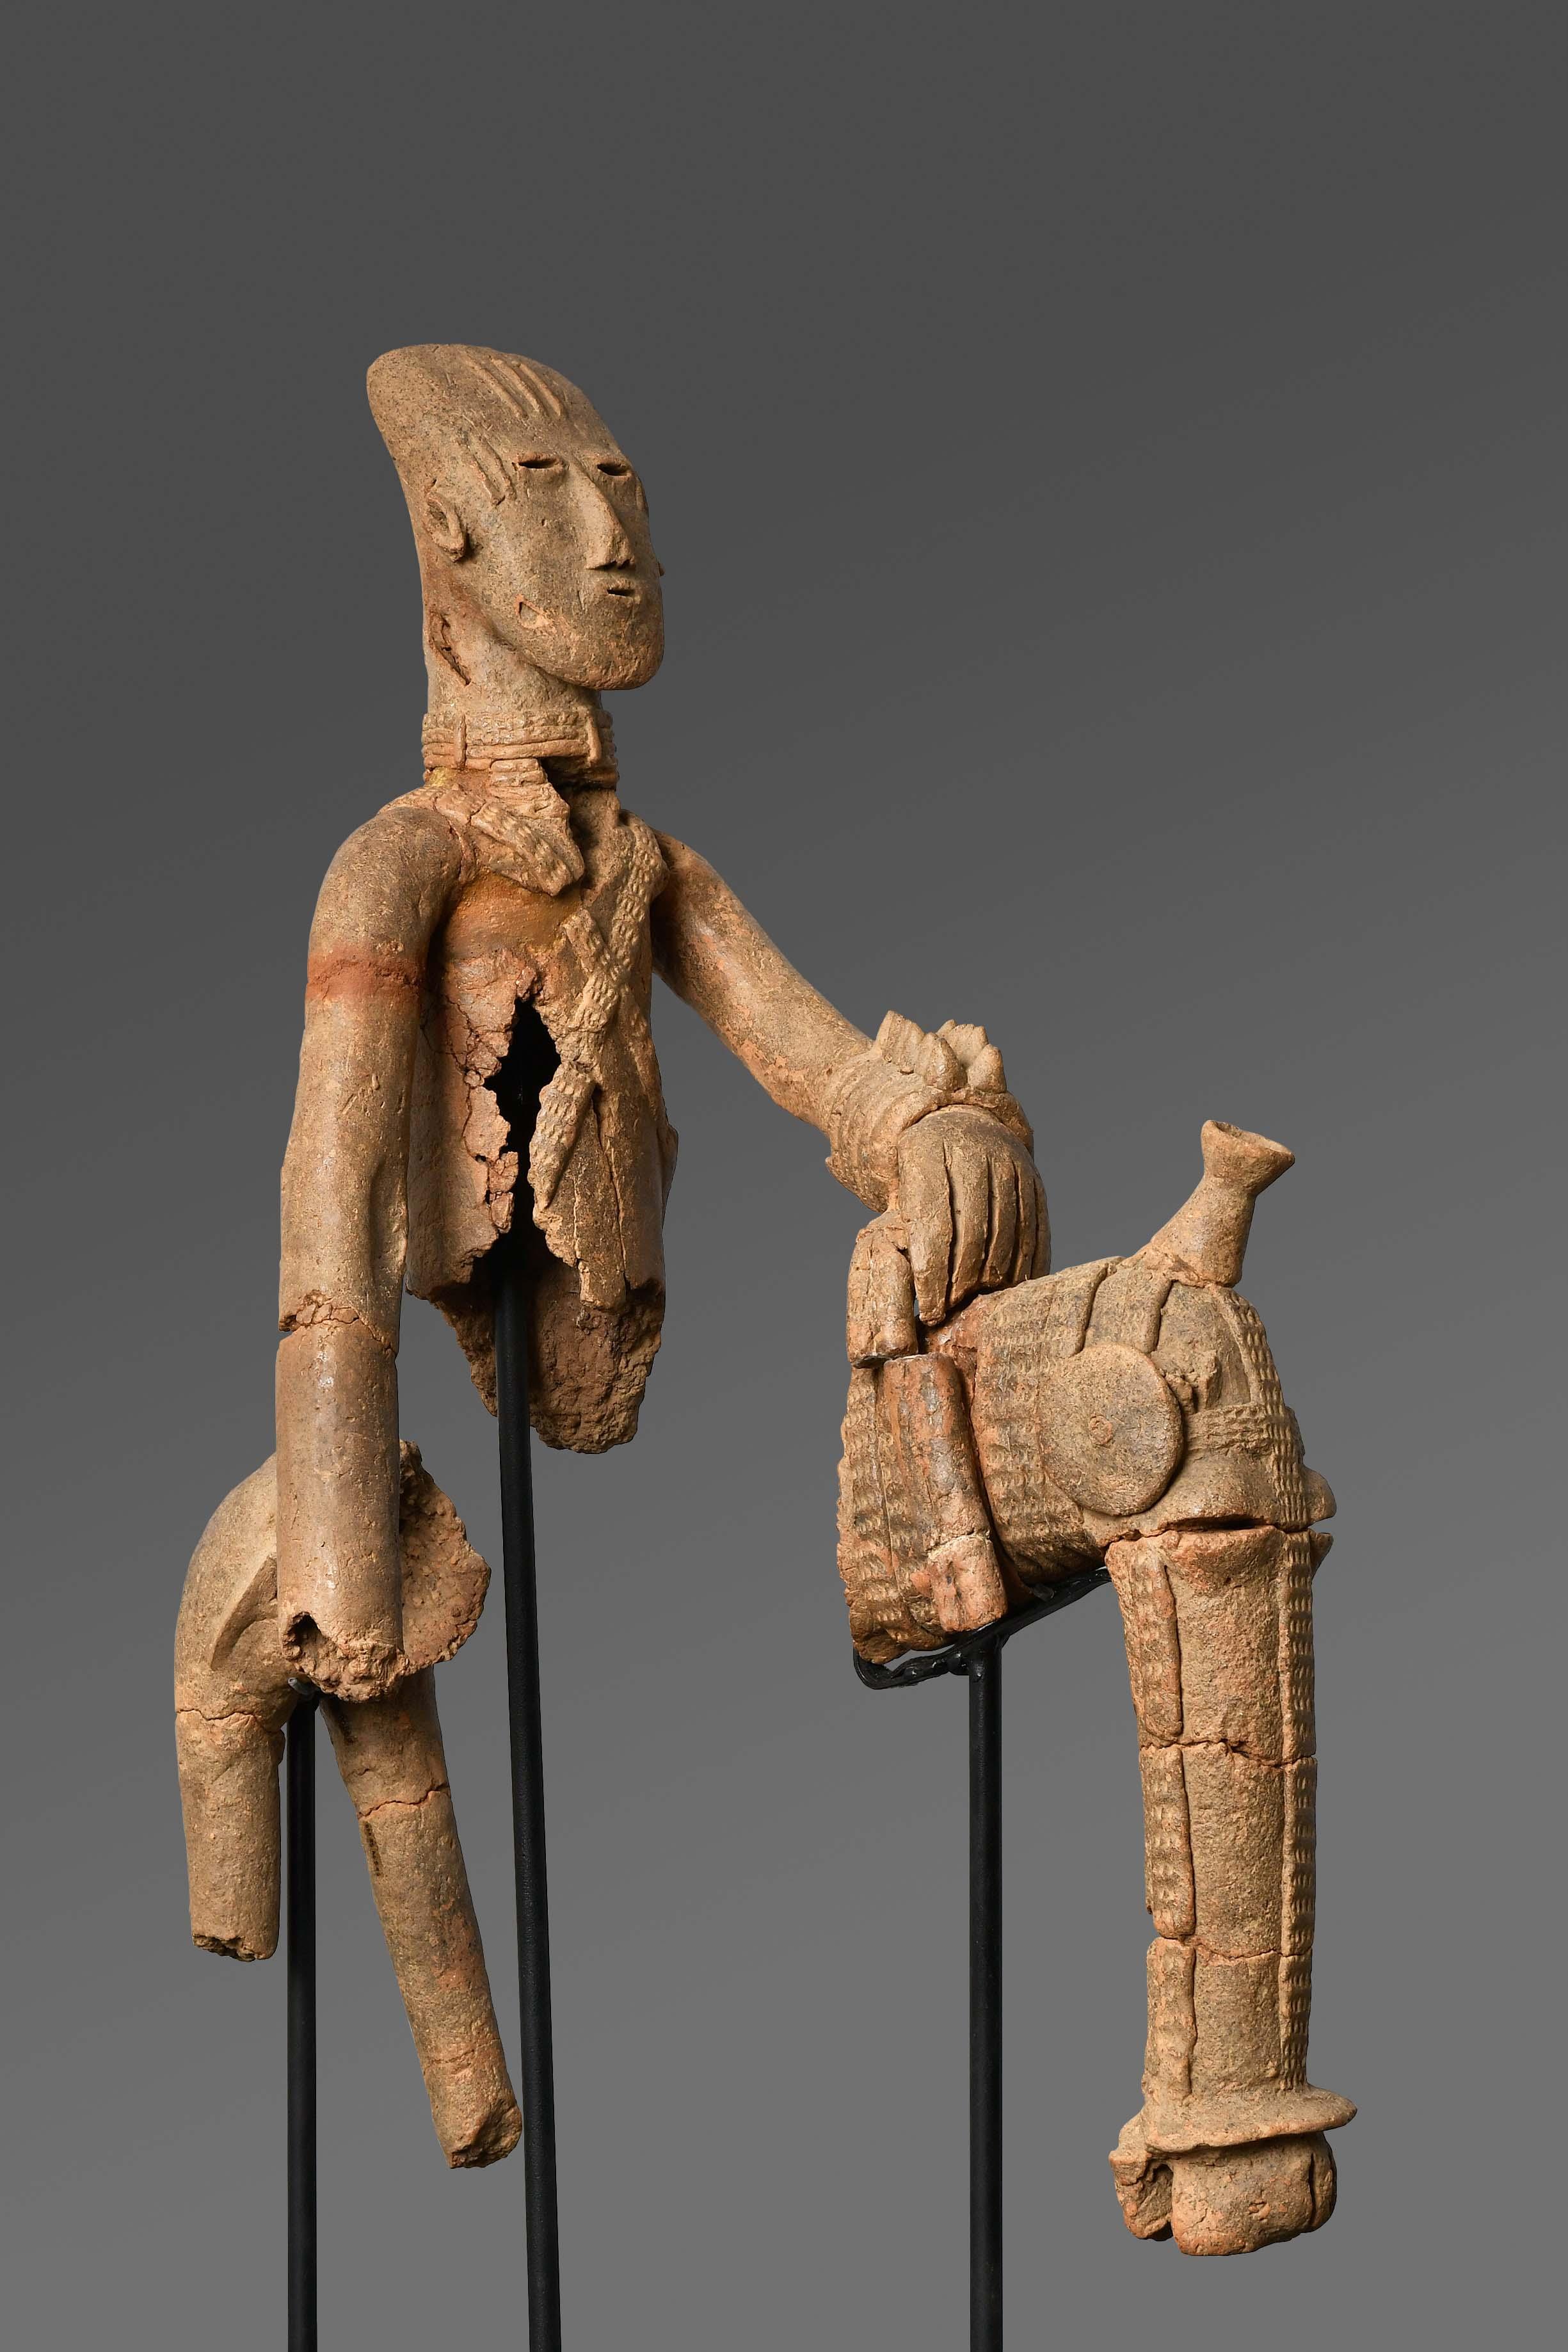 Equestrian, Bura-Asinda-Sikka Site, Niger 3rd–10th century,  Photo credit: © Photo Maurice Ascani. www.photographe-niger.com